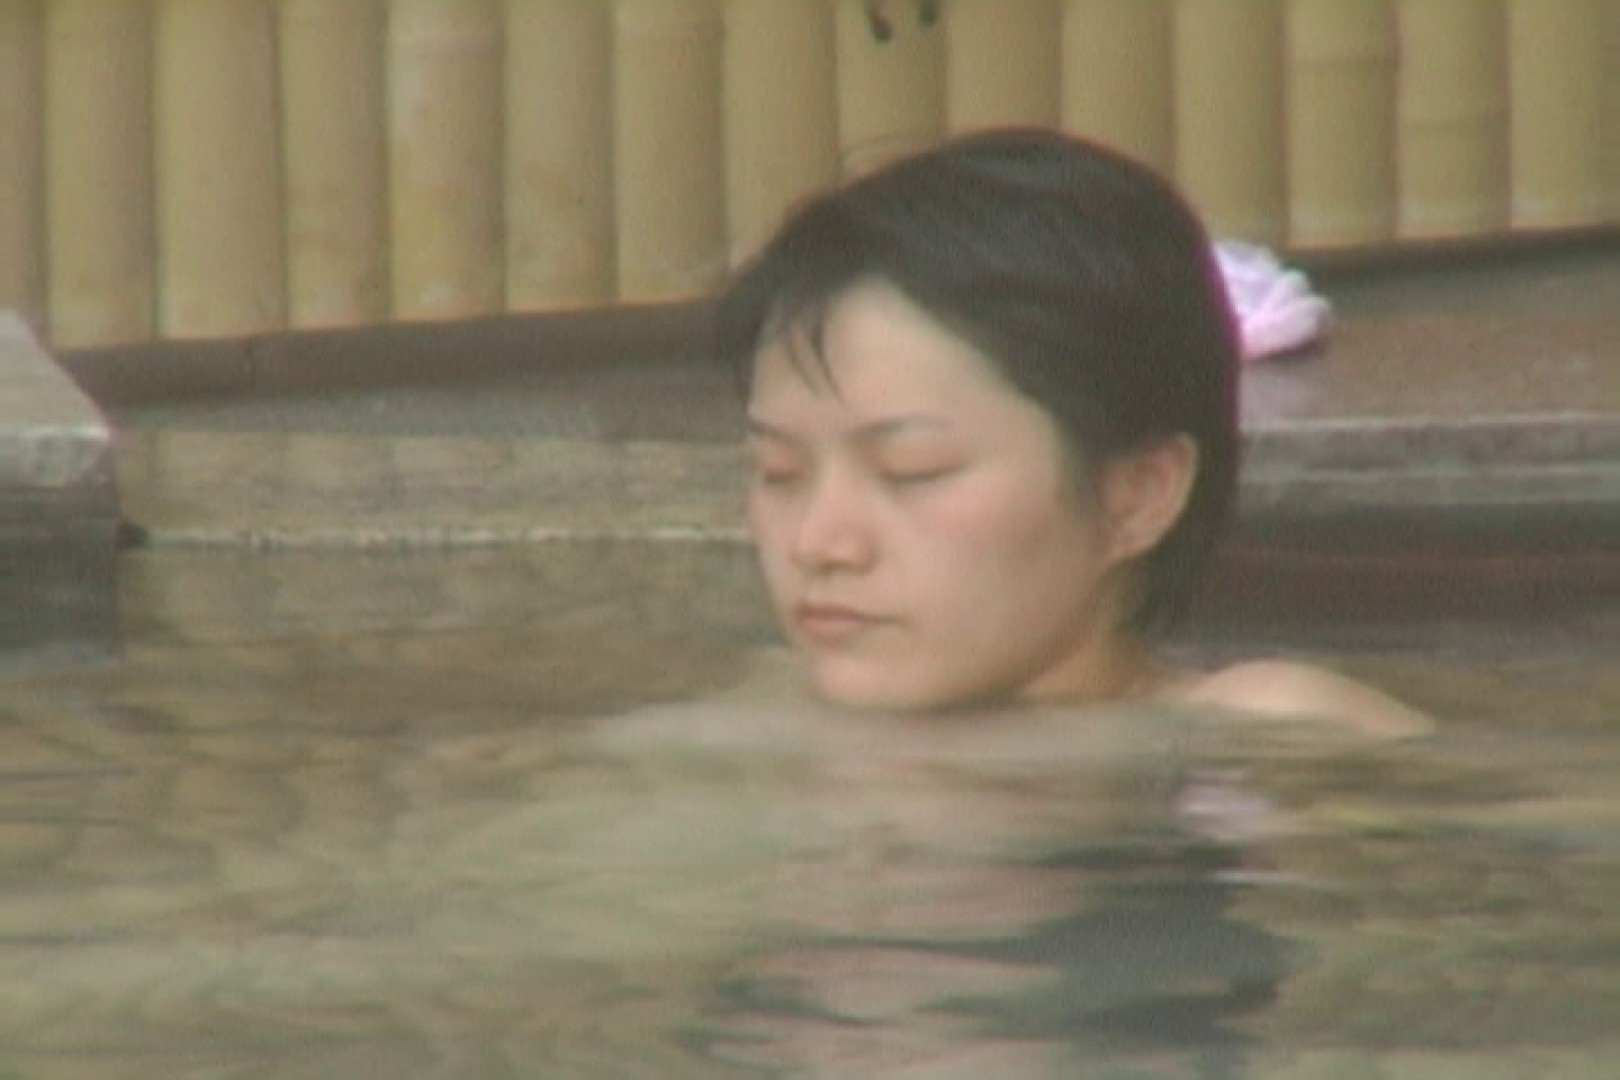 Aquaな露天風呂Vol.116 盗撮映像  42Pix 7